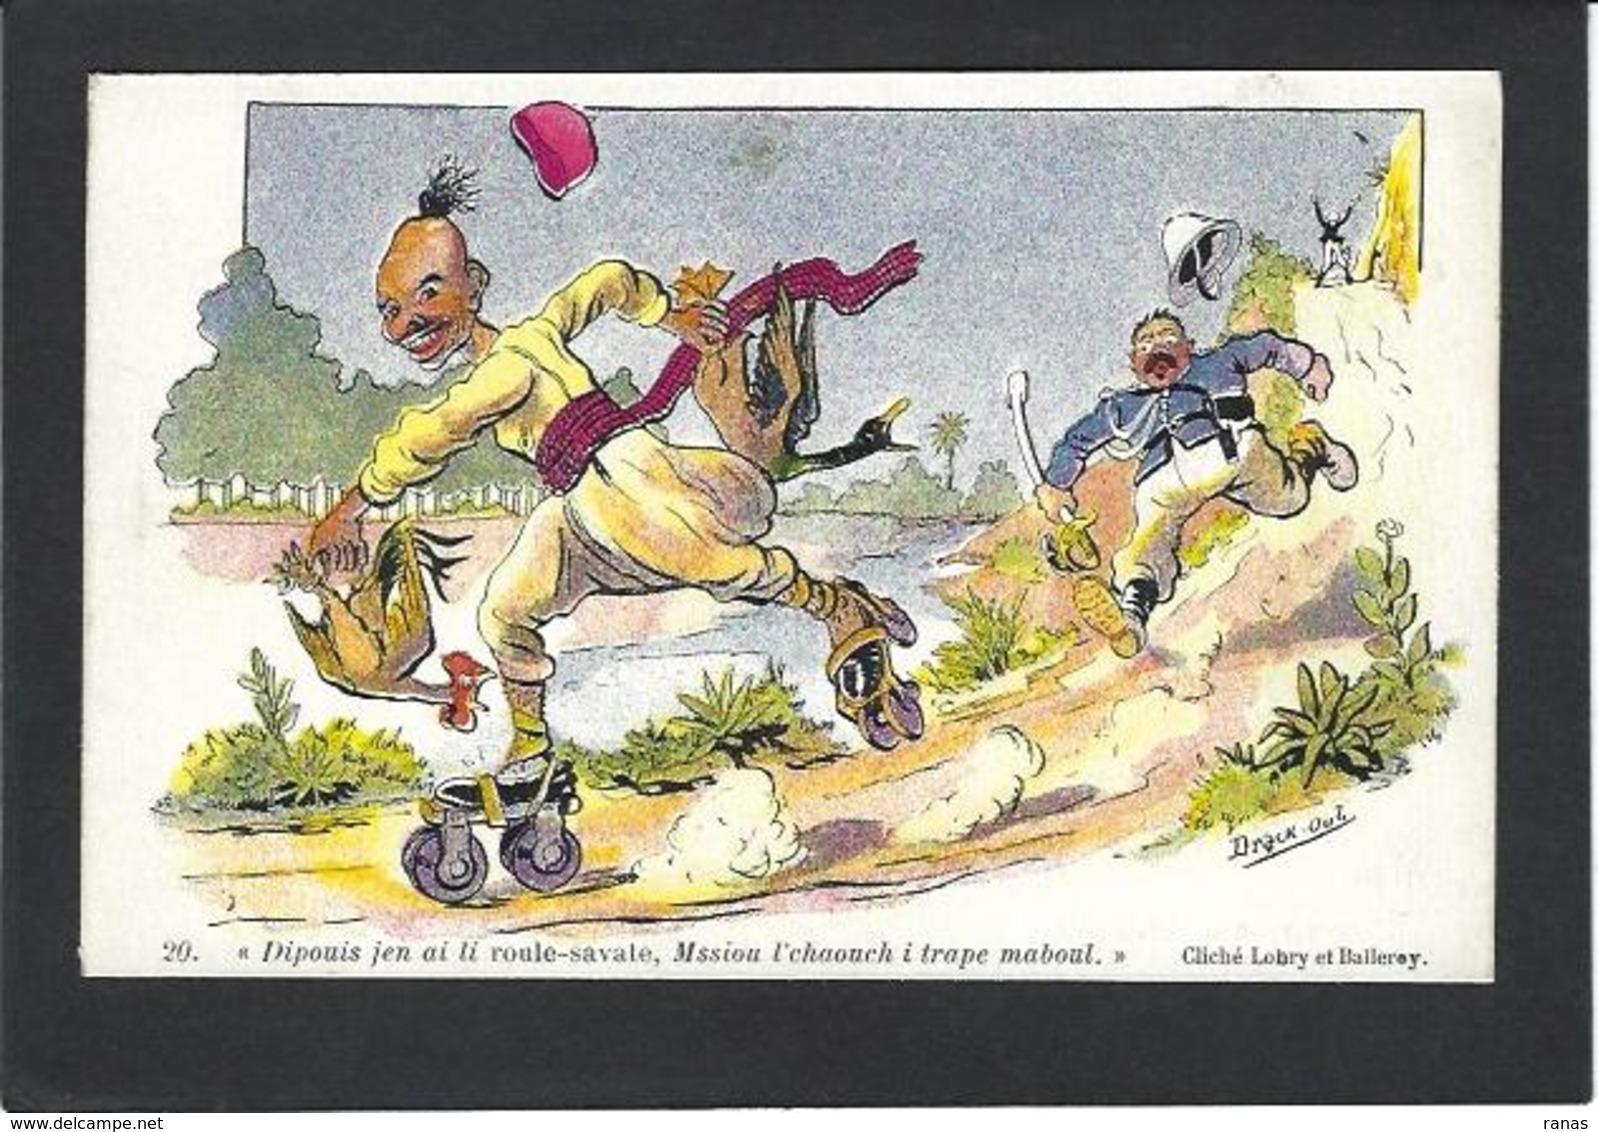 CPA Drack Oub Type CHAGNY Illustrateur Arabe Algerie écrite Patin à Roulettes Skating Roller - Illustrateurs & Photographes